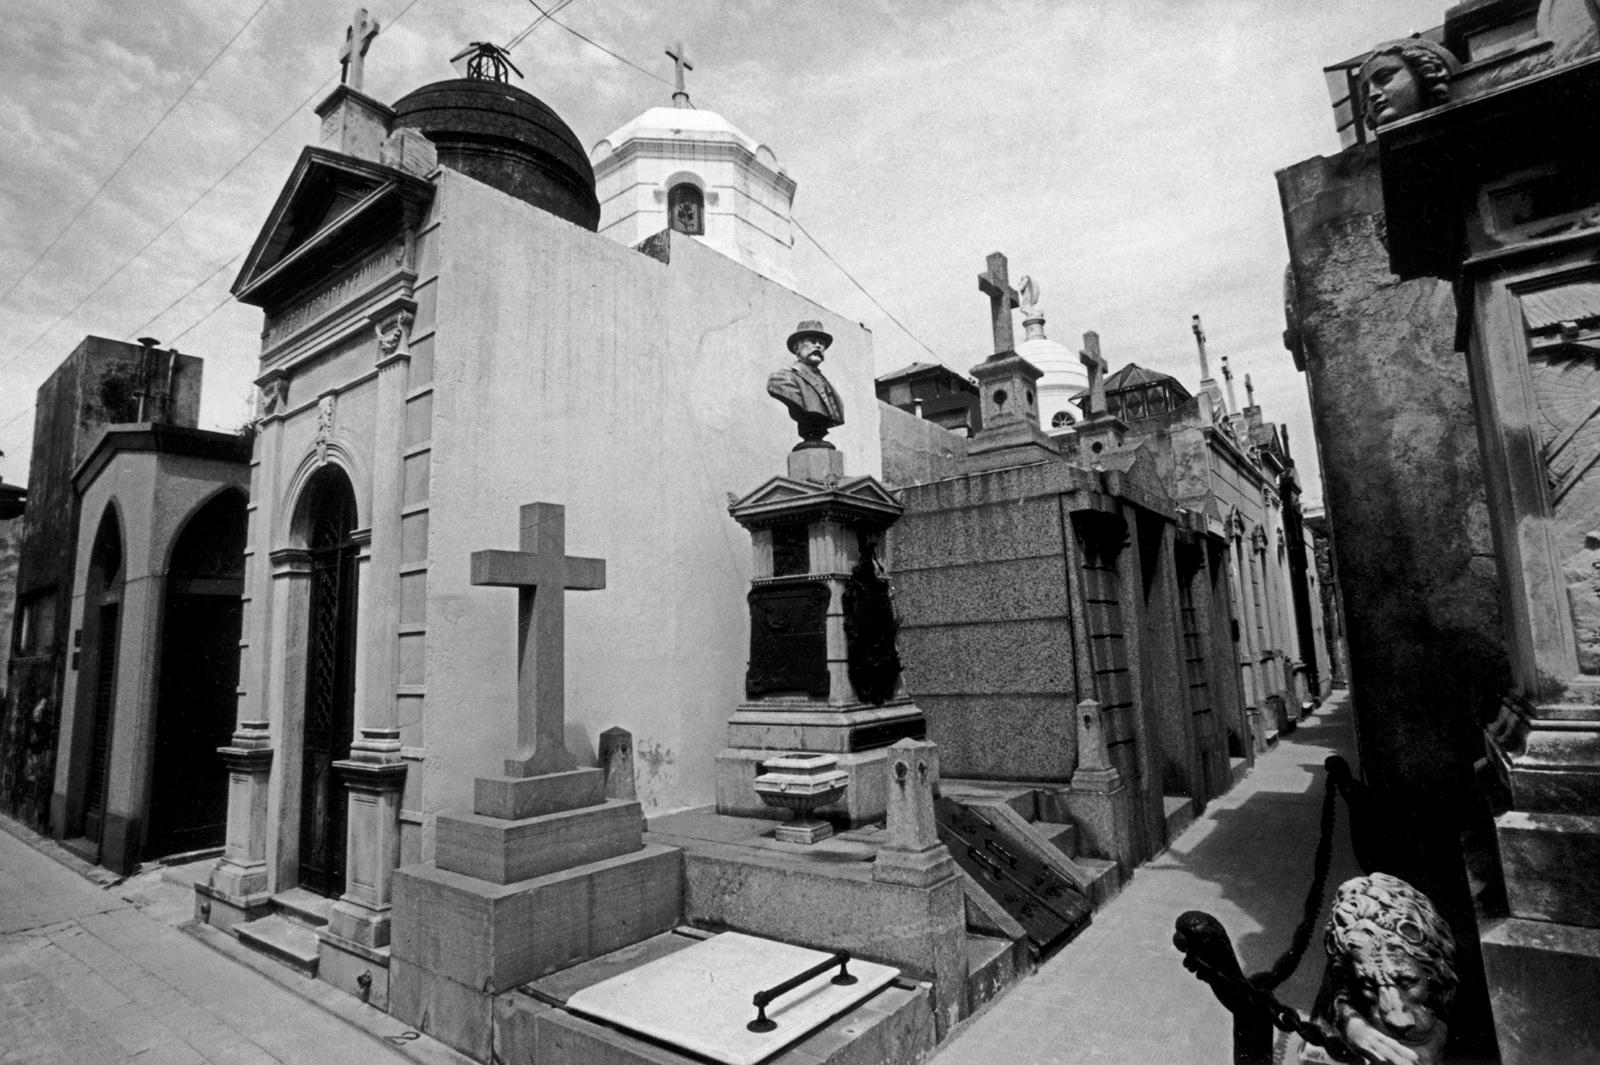 La Recoleta Cemetery, Buenos Aires, Argentina, 2002